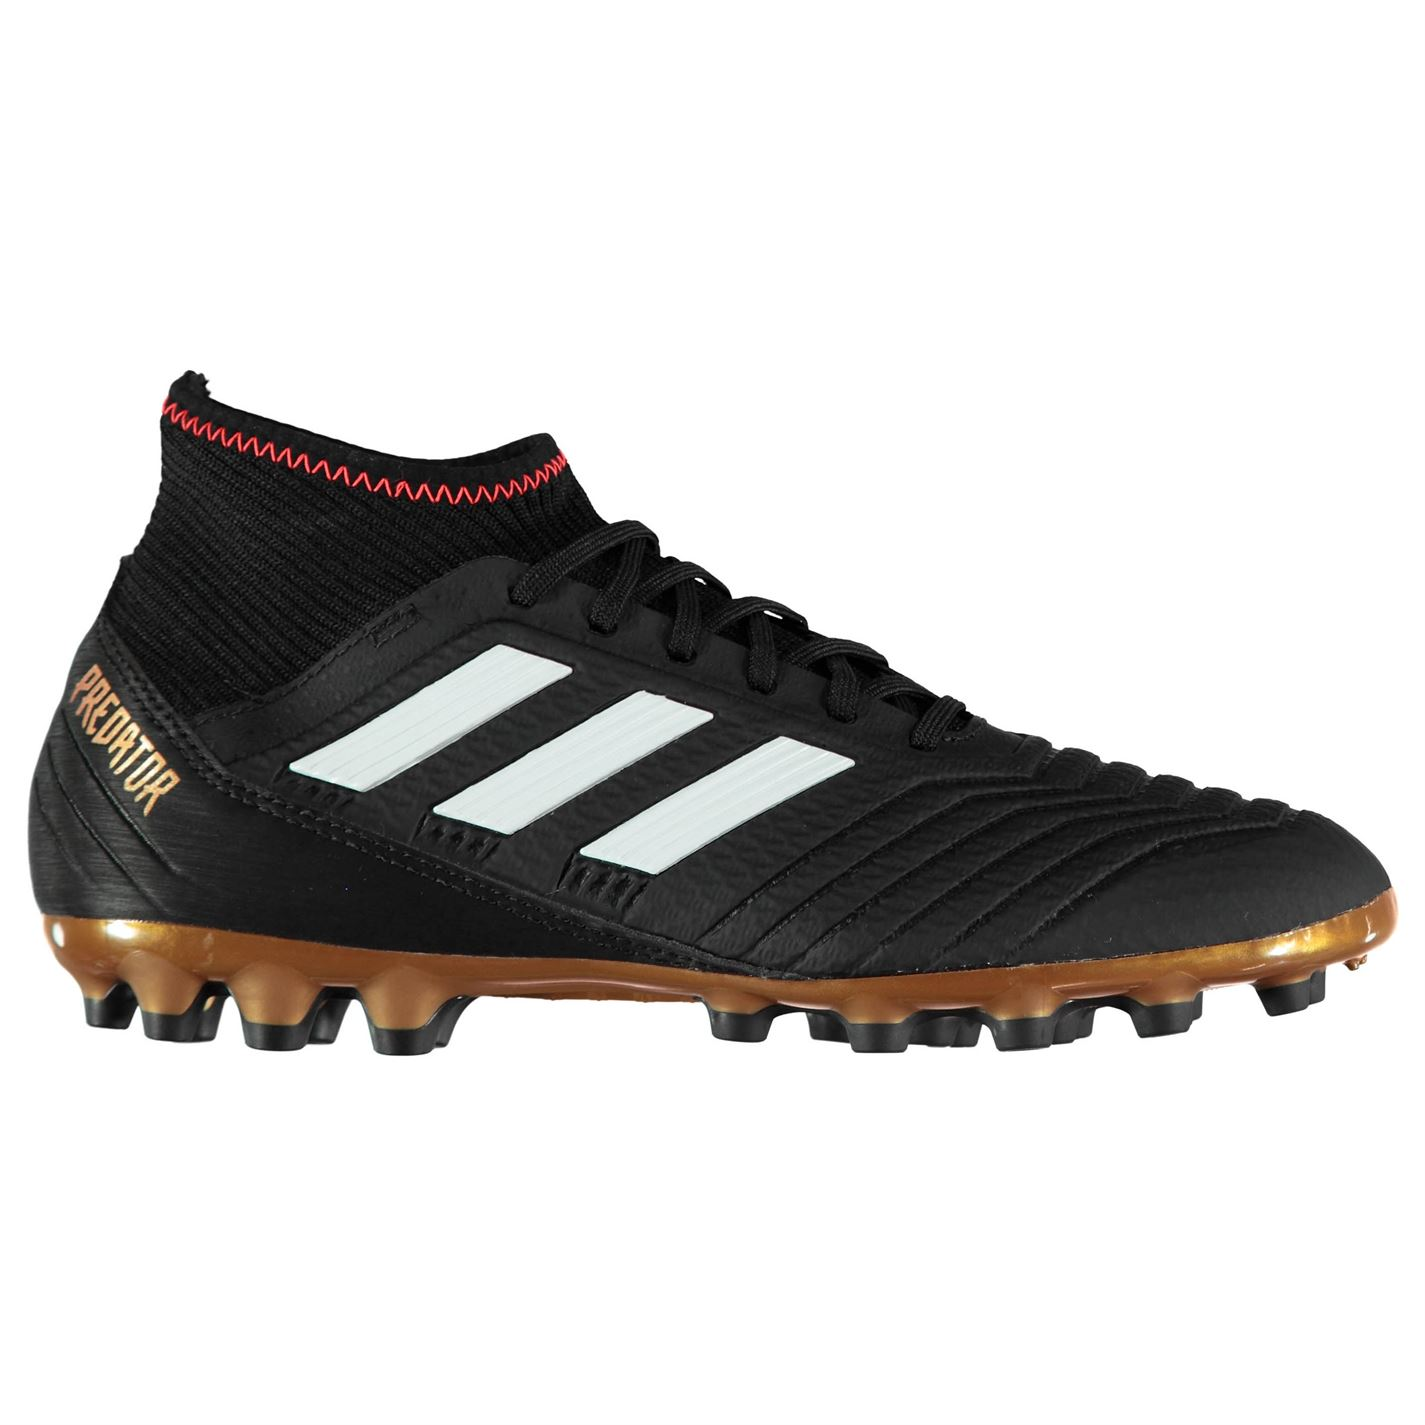 f12ebc0ca adidas Predator 18.3 Mens AG Football Boots Black/White/Red - Glami.cz